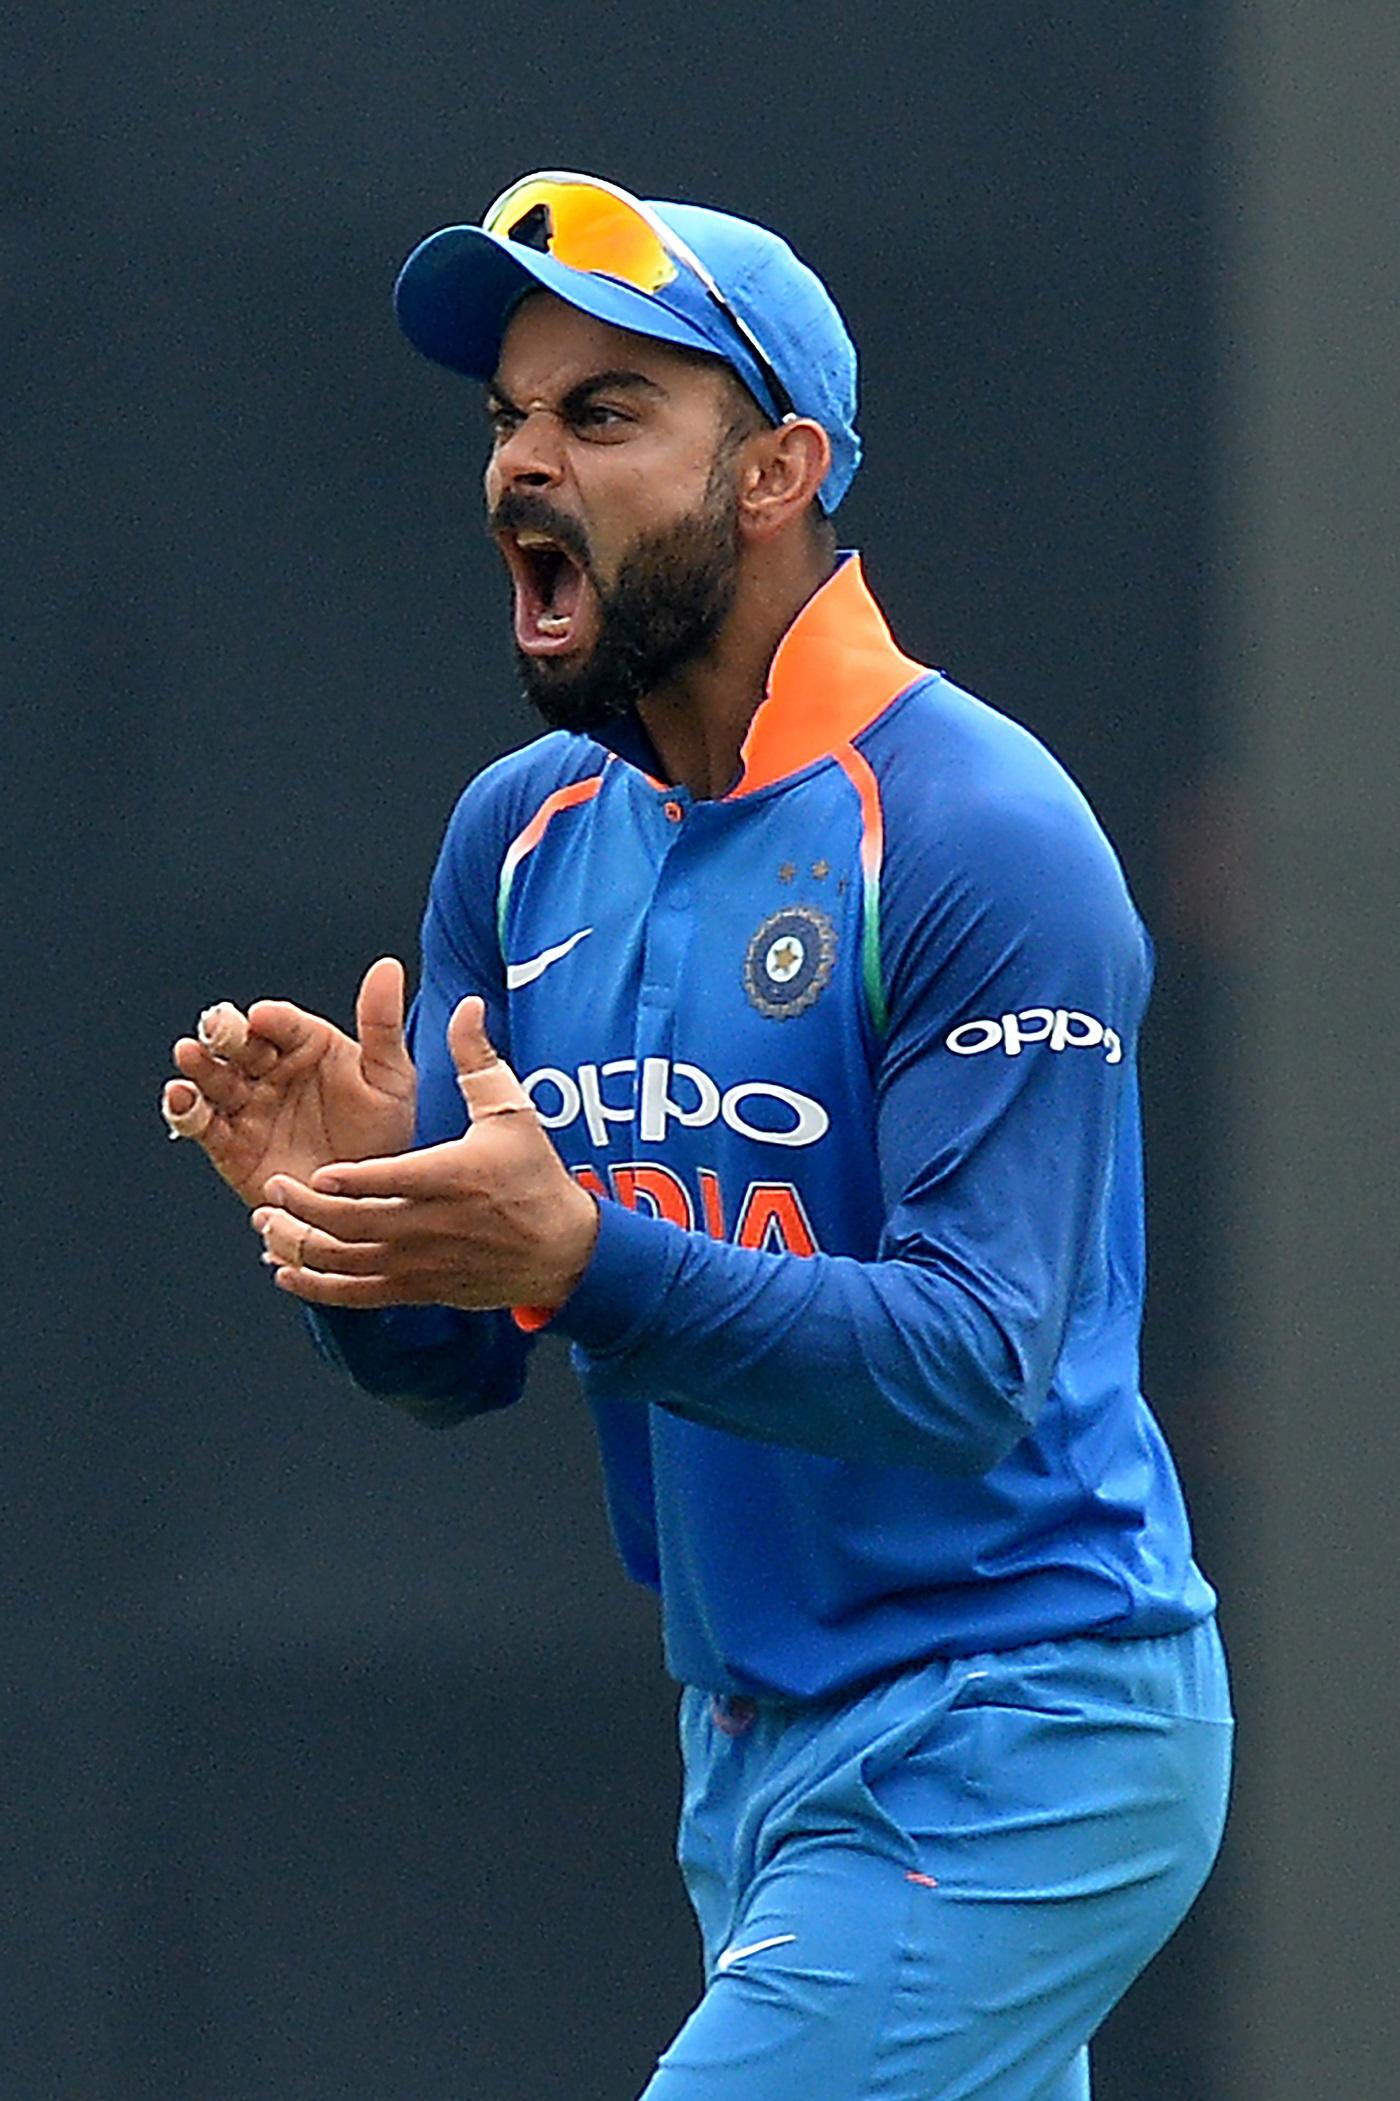 Twitter Berates Virat Kohli After He Tells Fan To Leave India 10